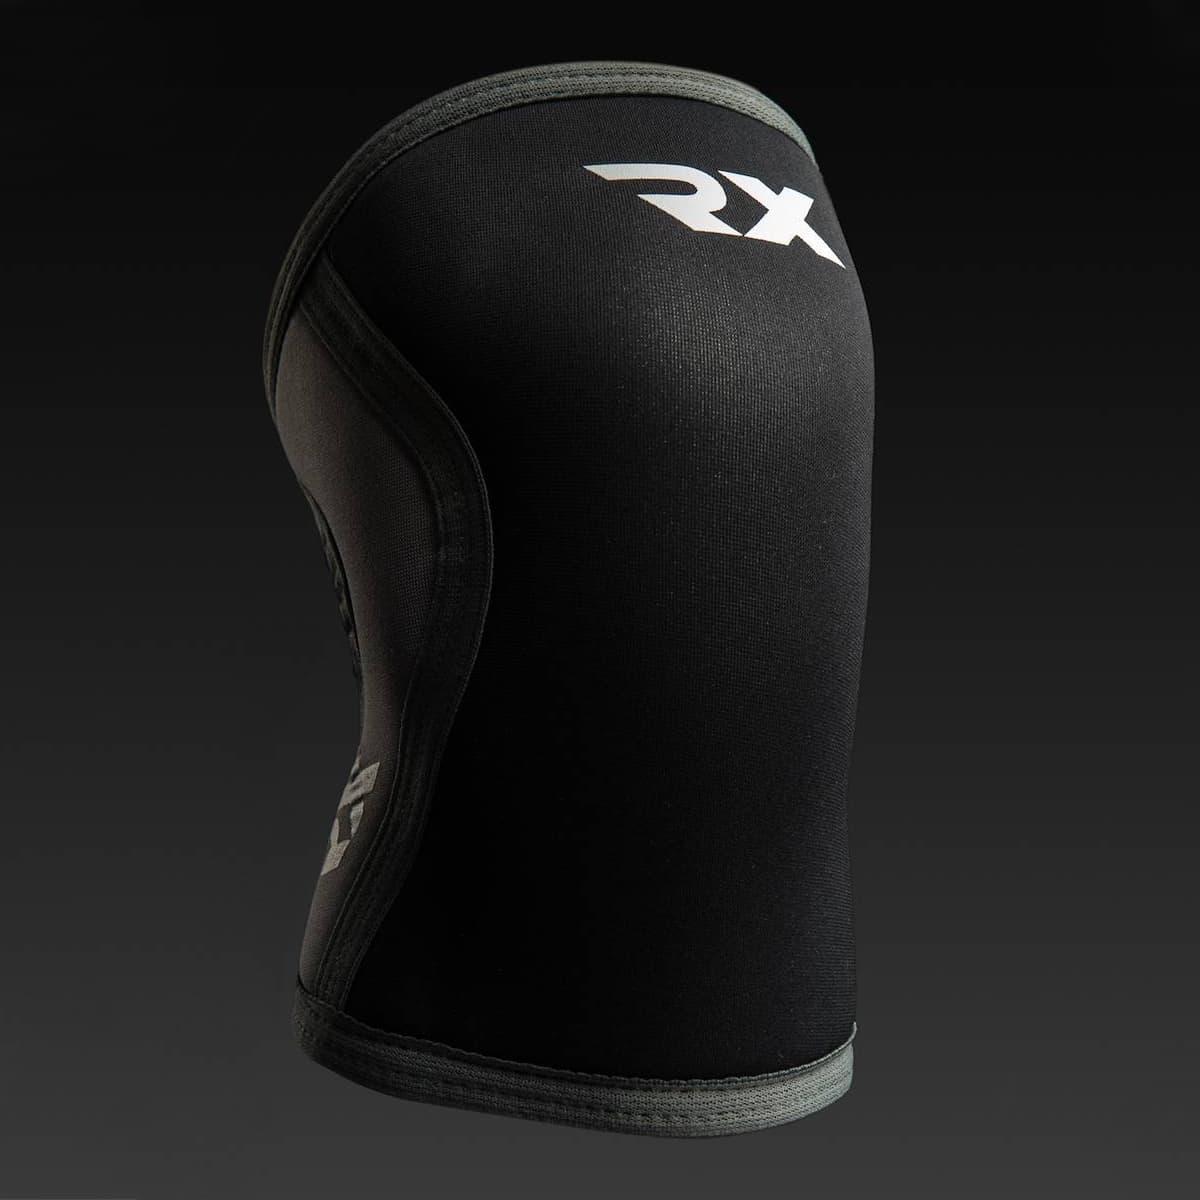 Наколенники RX 7мм